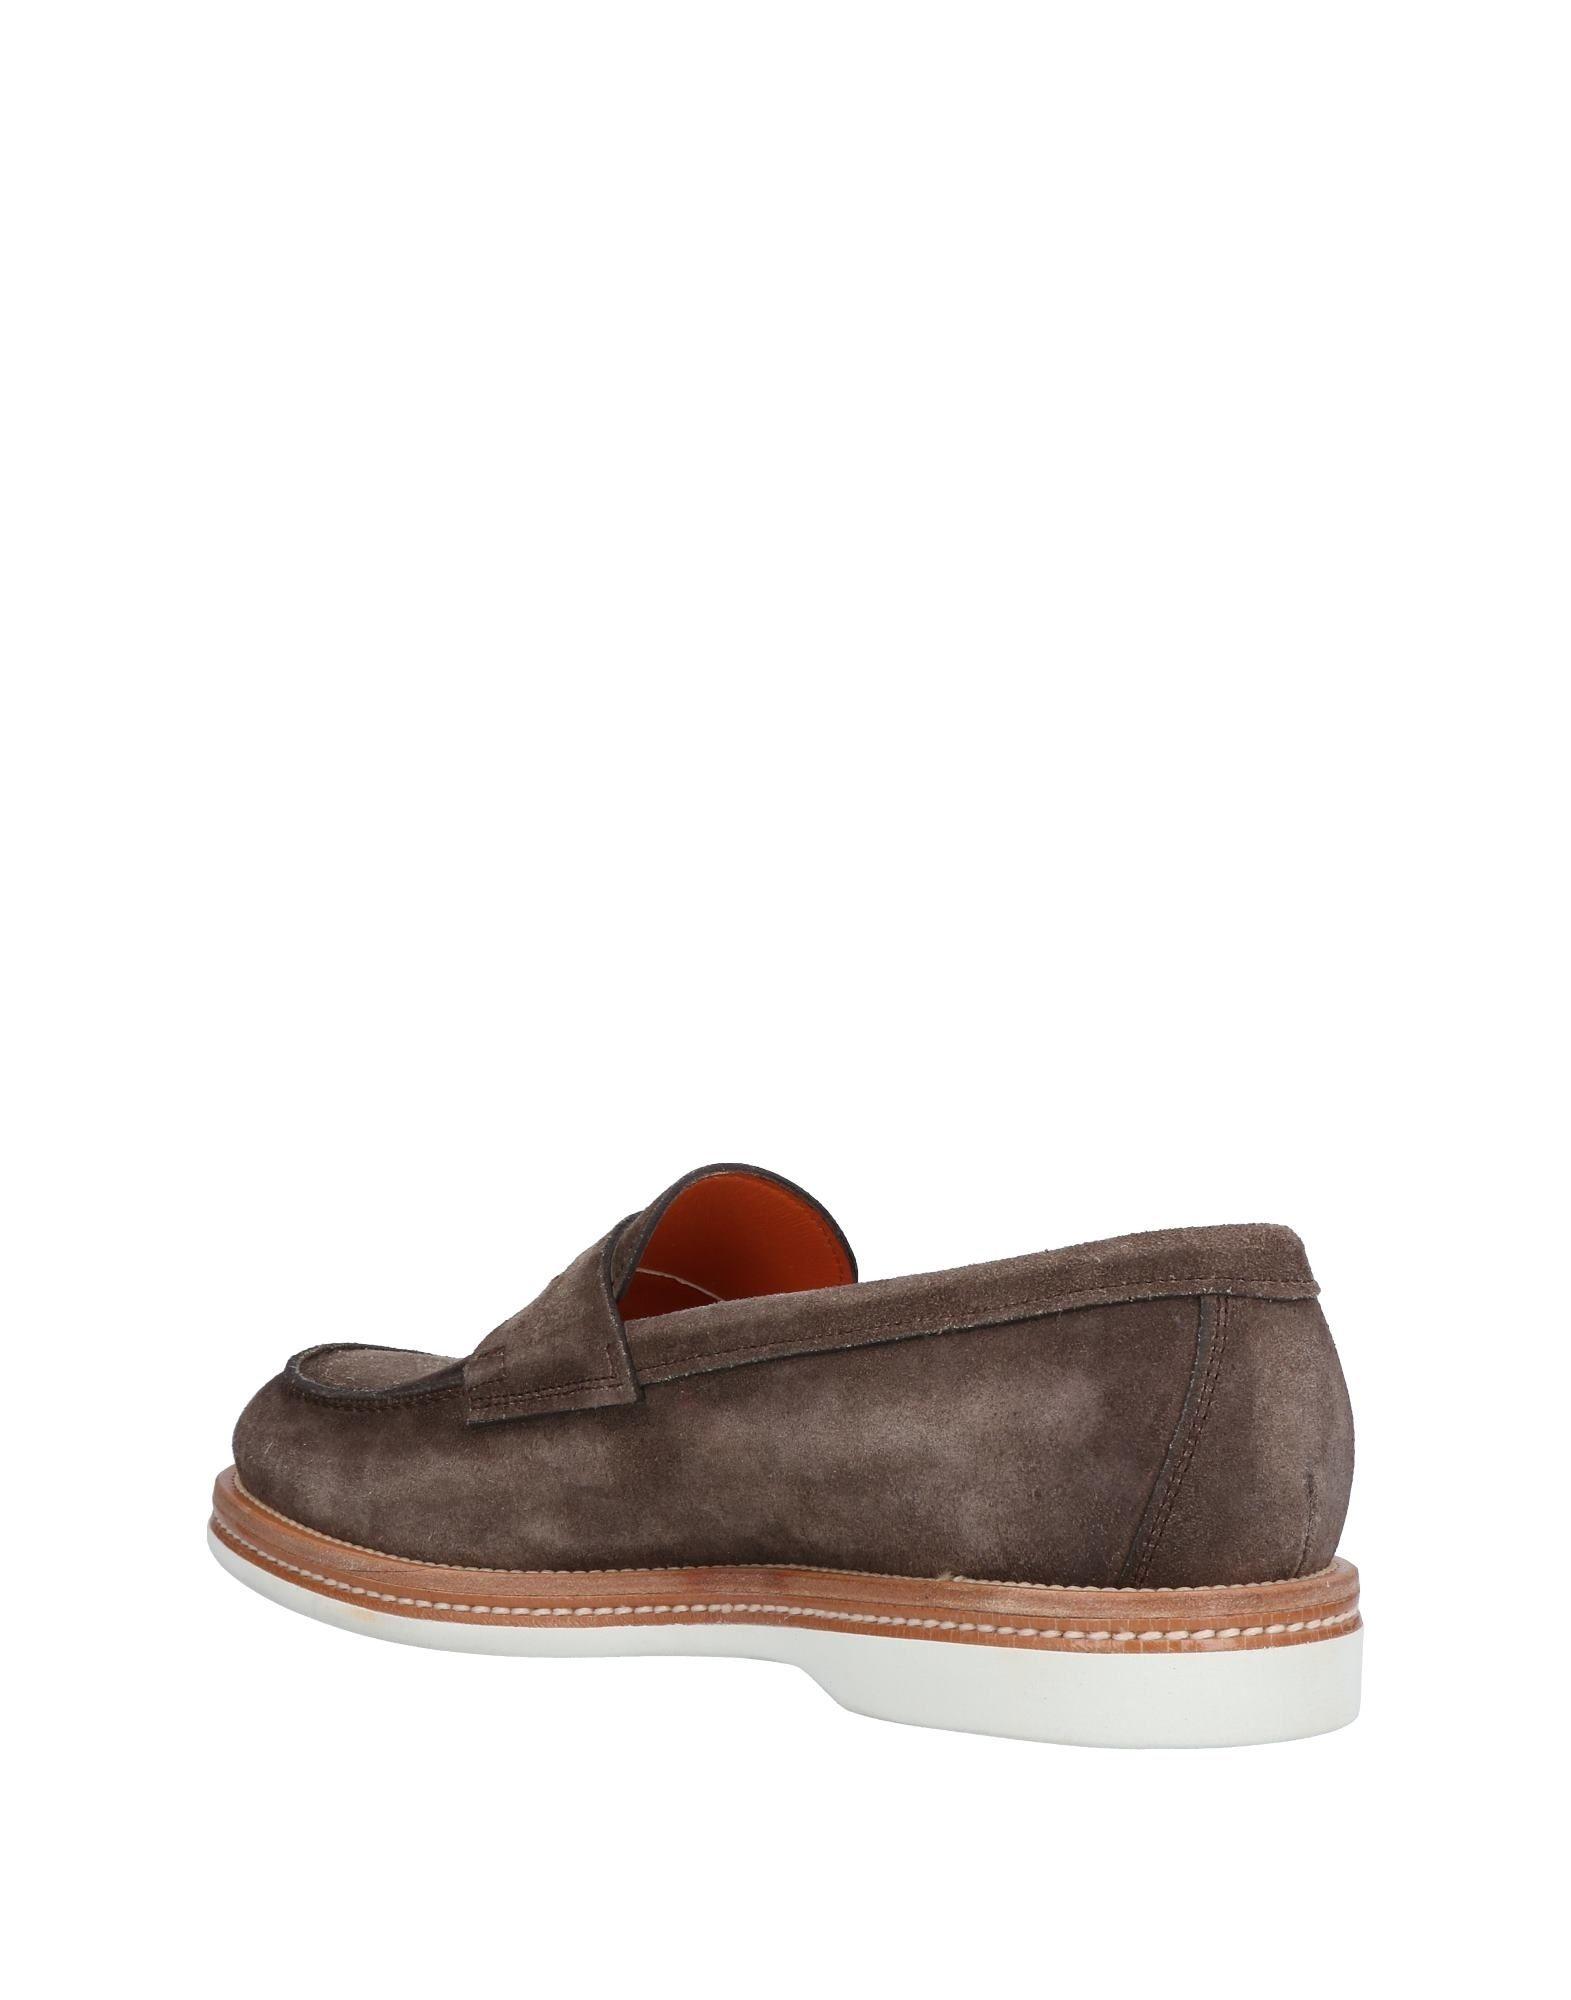 Santoni Mokassins Herren  Schuhe 11478524UF Heiße Schuhe  eb71af